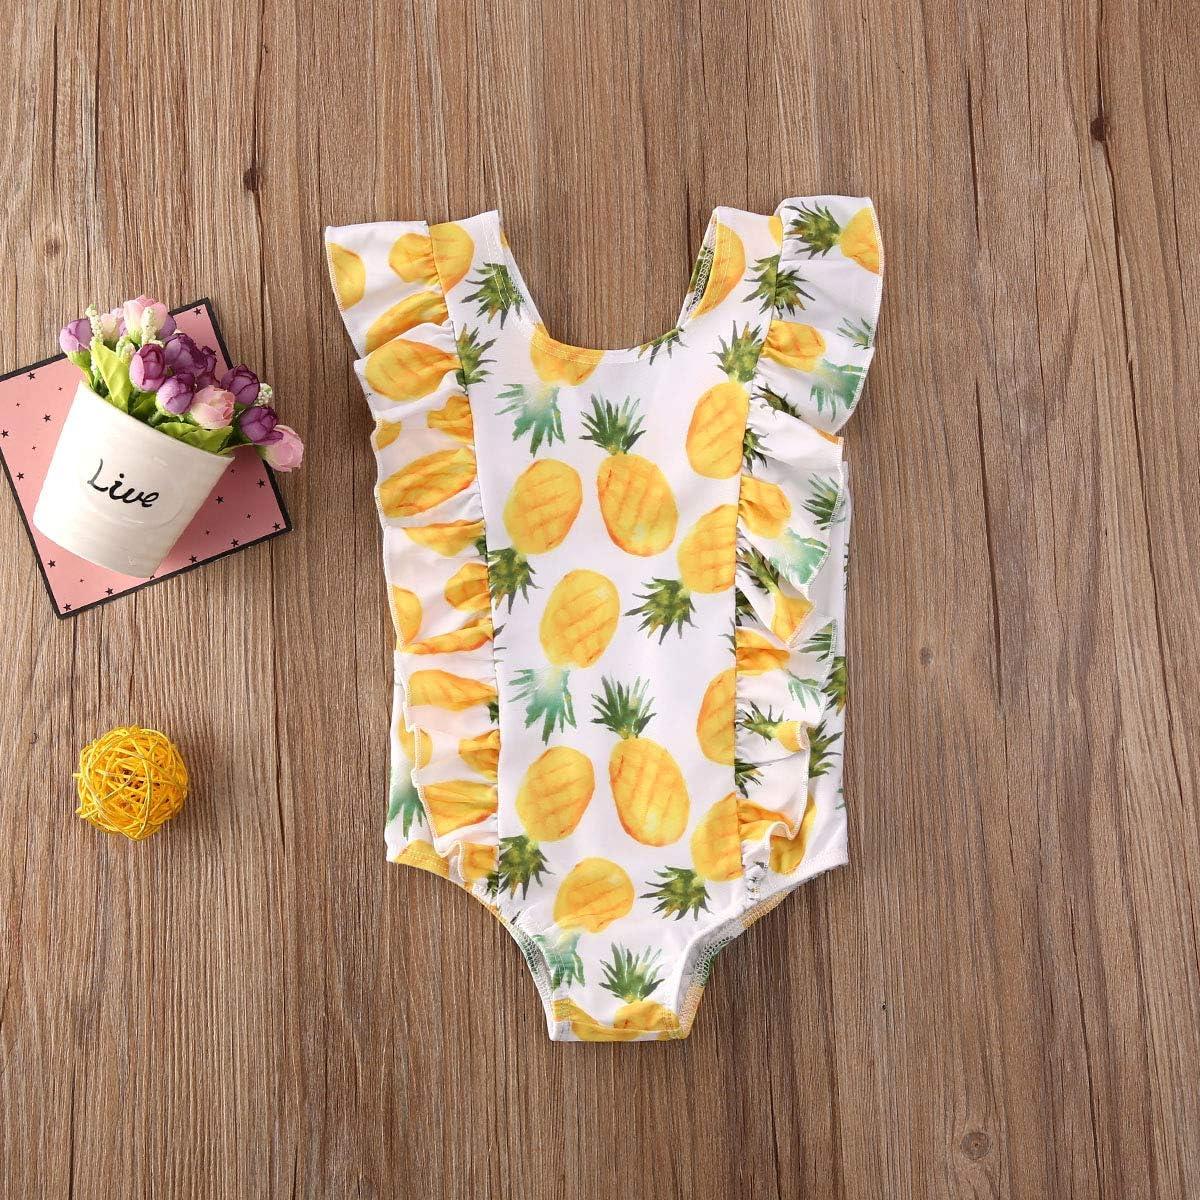 Merqwadd Toddler Baby Girls Cute Fashion Ruffle Swimsuit Kids Bathing Suit Beachwear